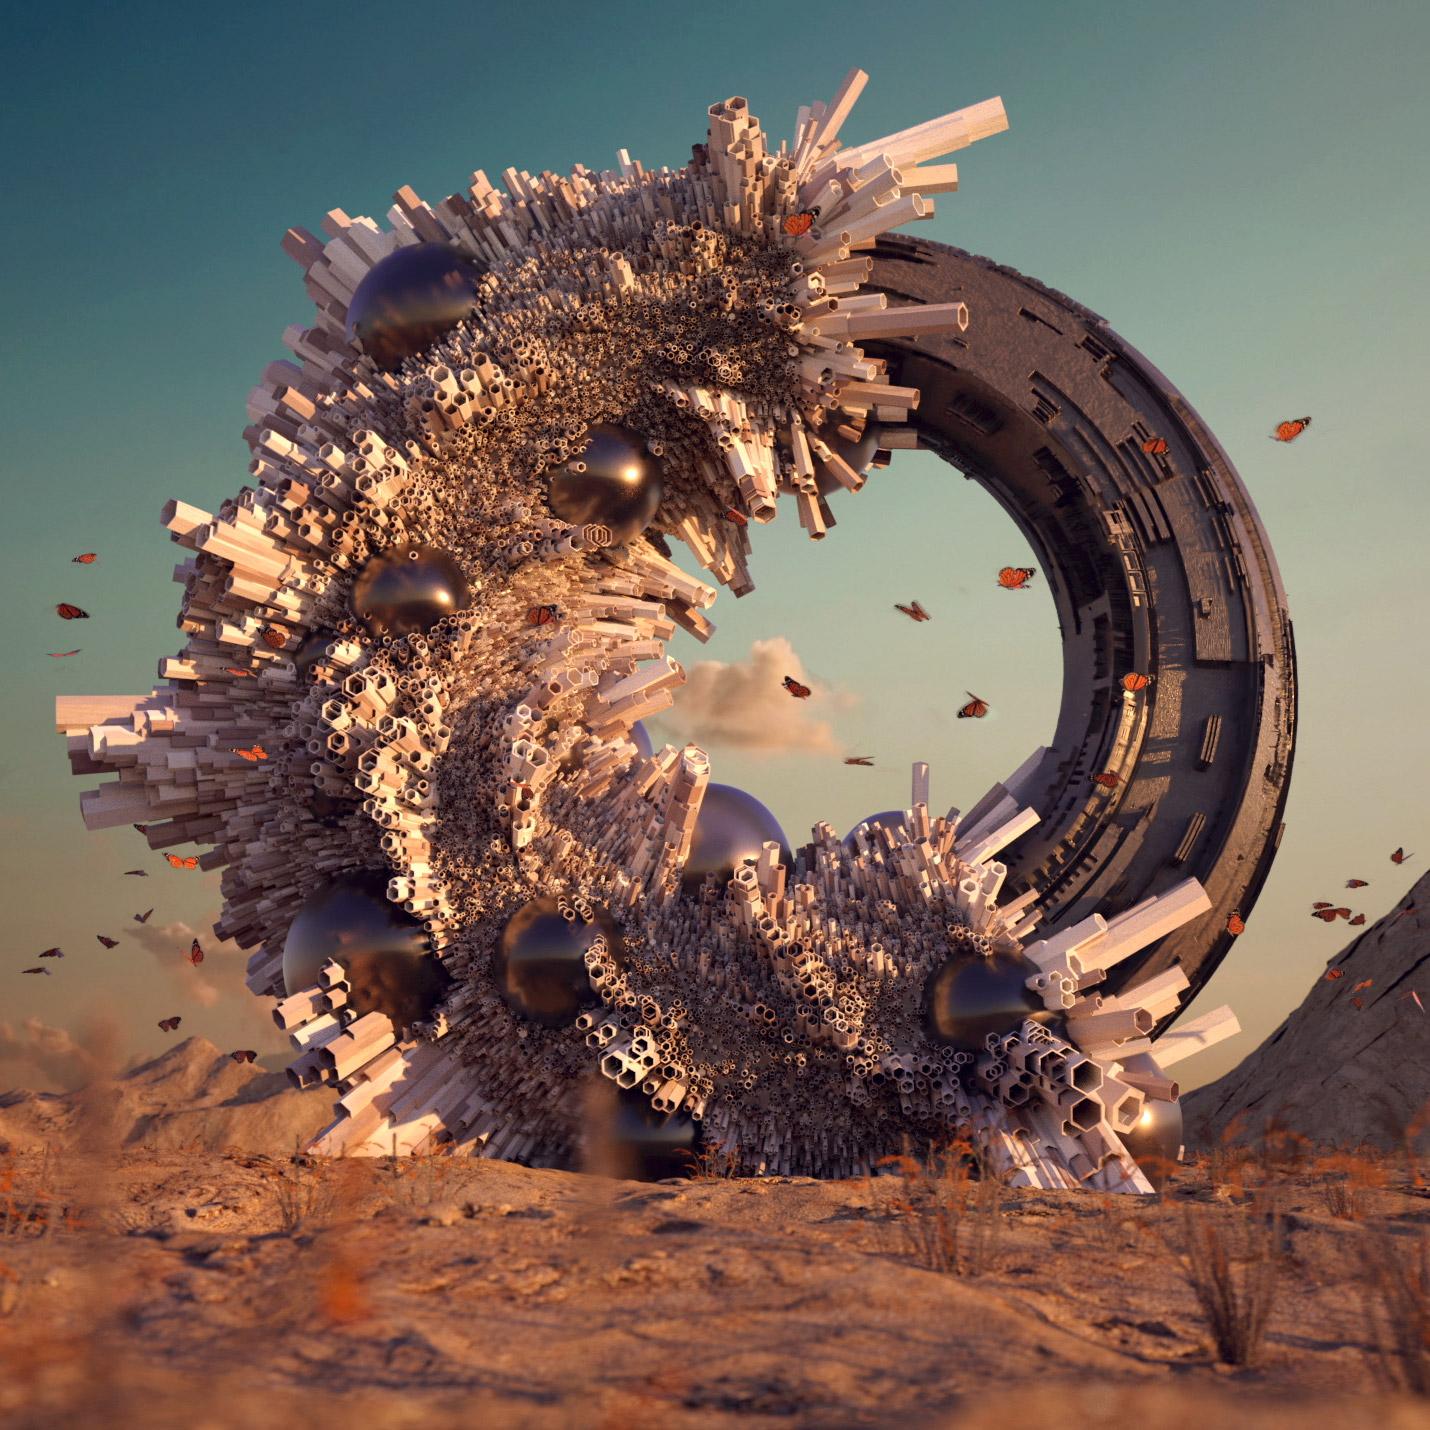 ScatterTwist-desert2-cam1